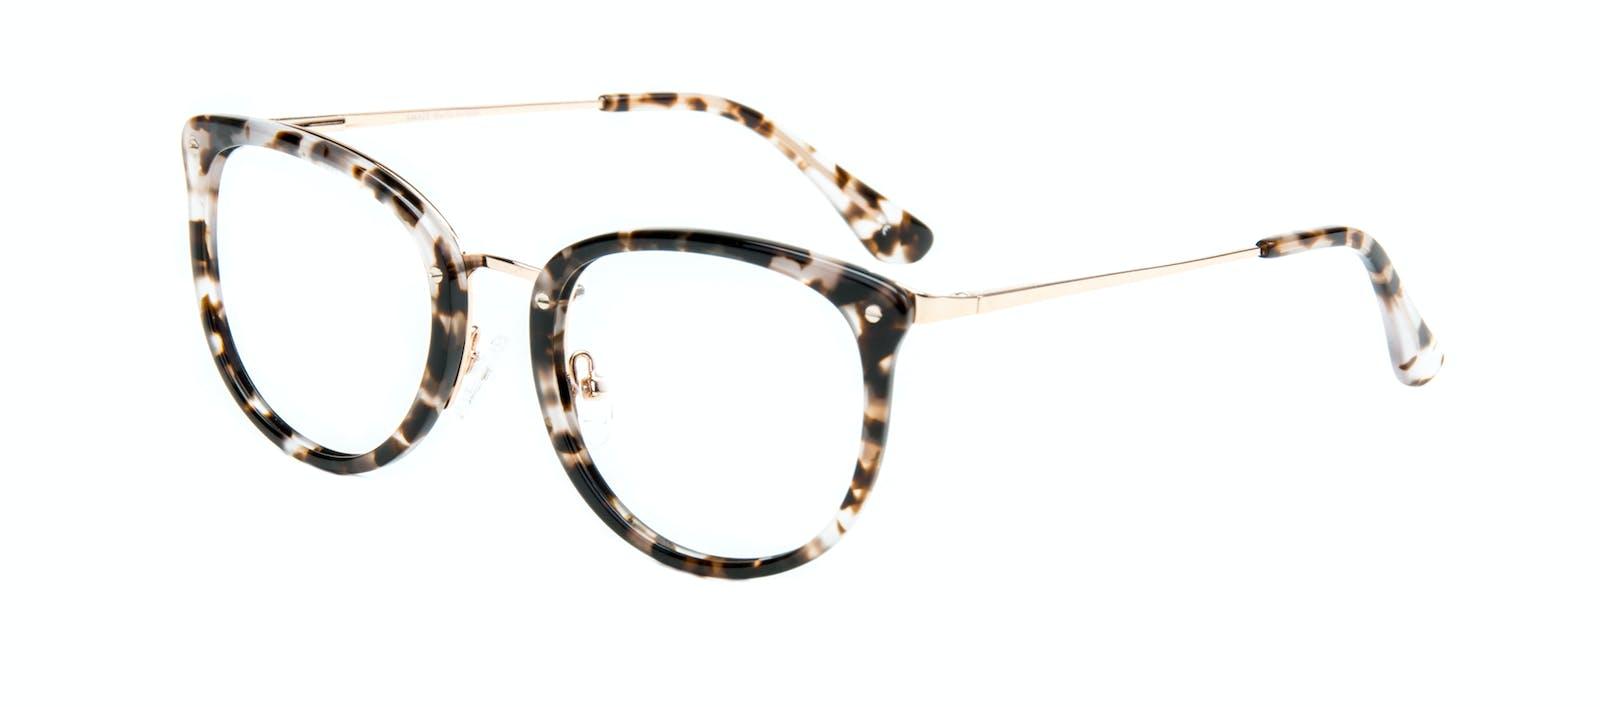 e572c5d2aa Affordable Fashion Glasses Square Round Eyeglasses Women Amaze Mocha  Tortoise Tilt